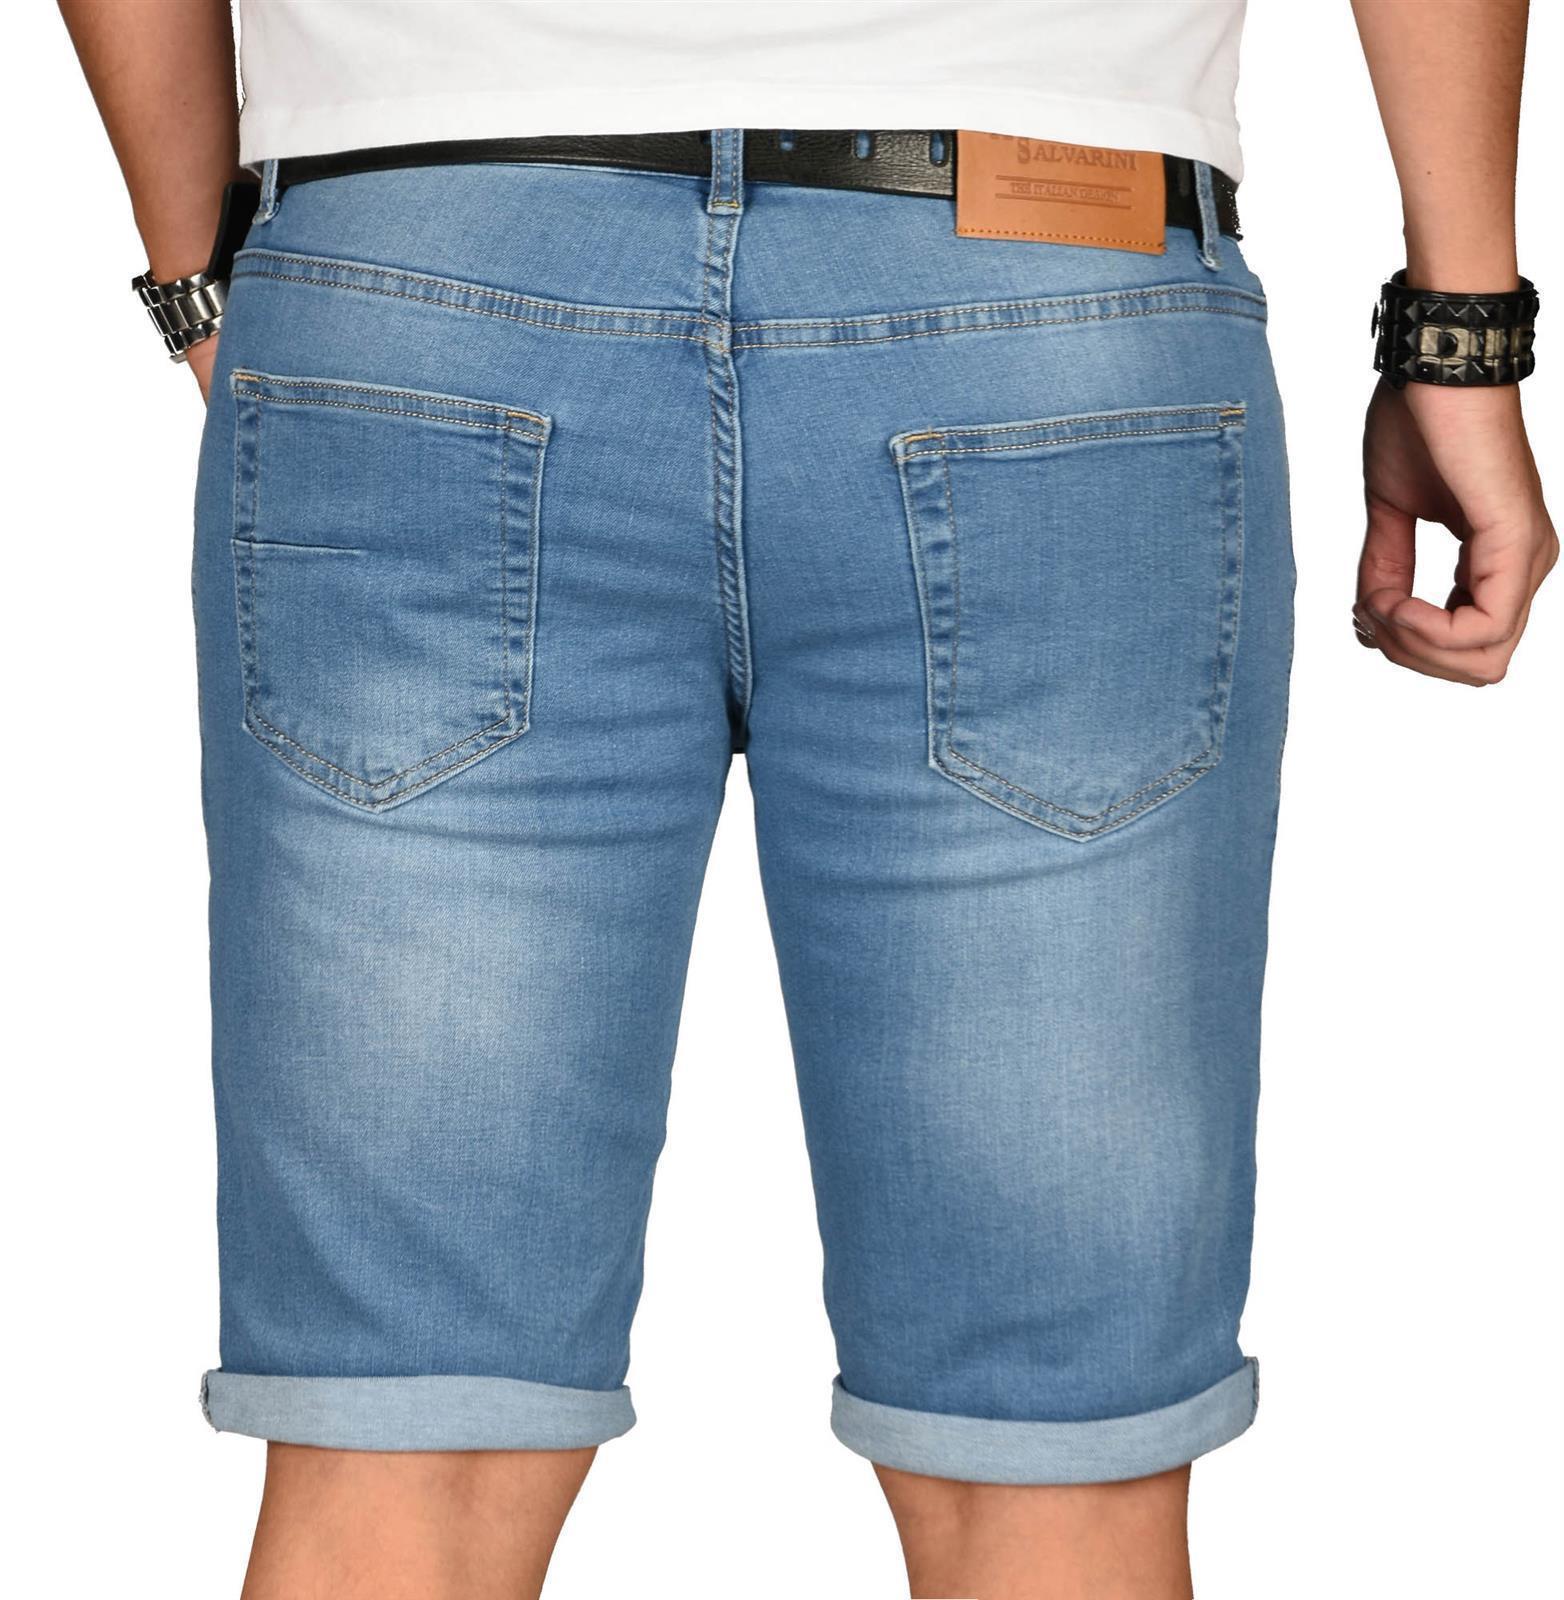 A-Salvarini-Herren-Designer-Jeans-Short-kurze-Hose-Slim-Sommer-Shorts-Washed Indexbild 21